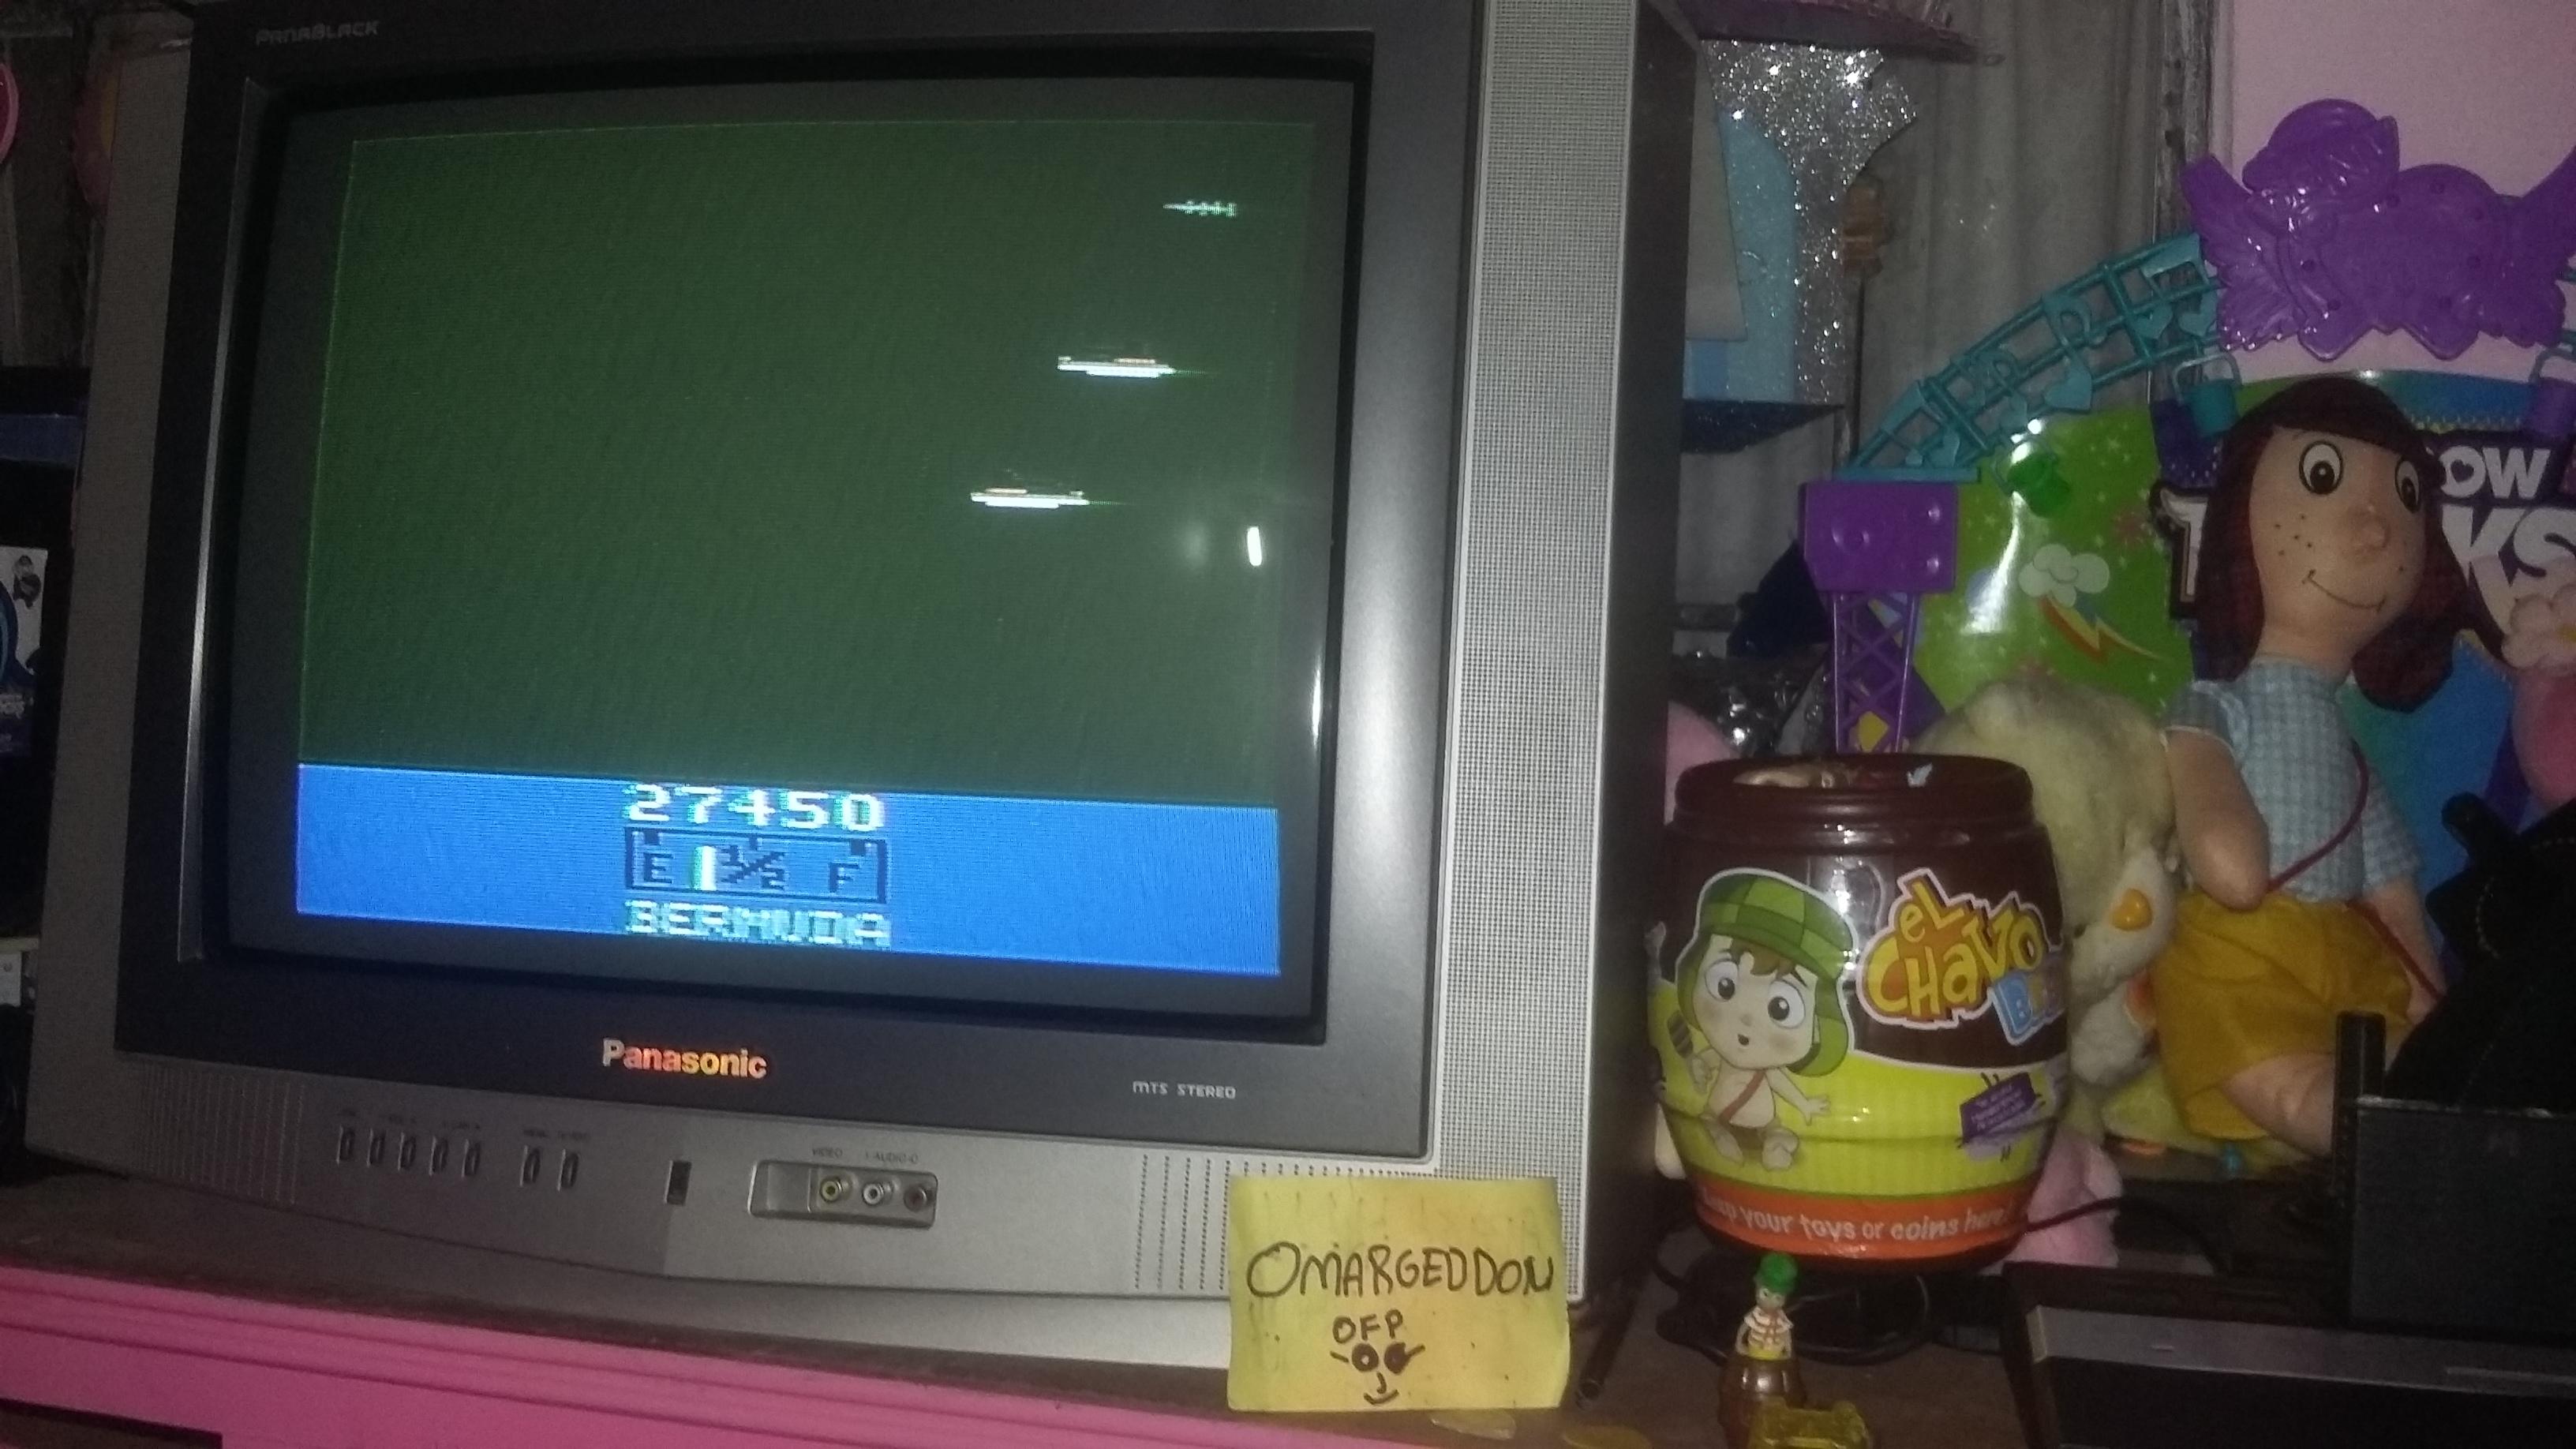 omargeddon: Bermuda (Atari 2600 Expert/A) 27,450 points on 2016-12-17 20:08:50